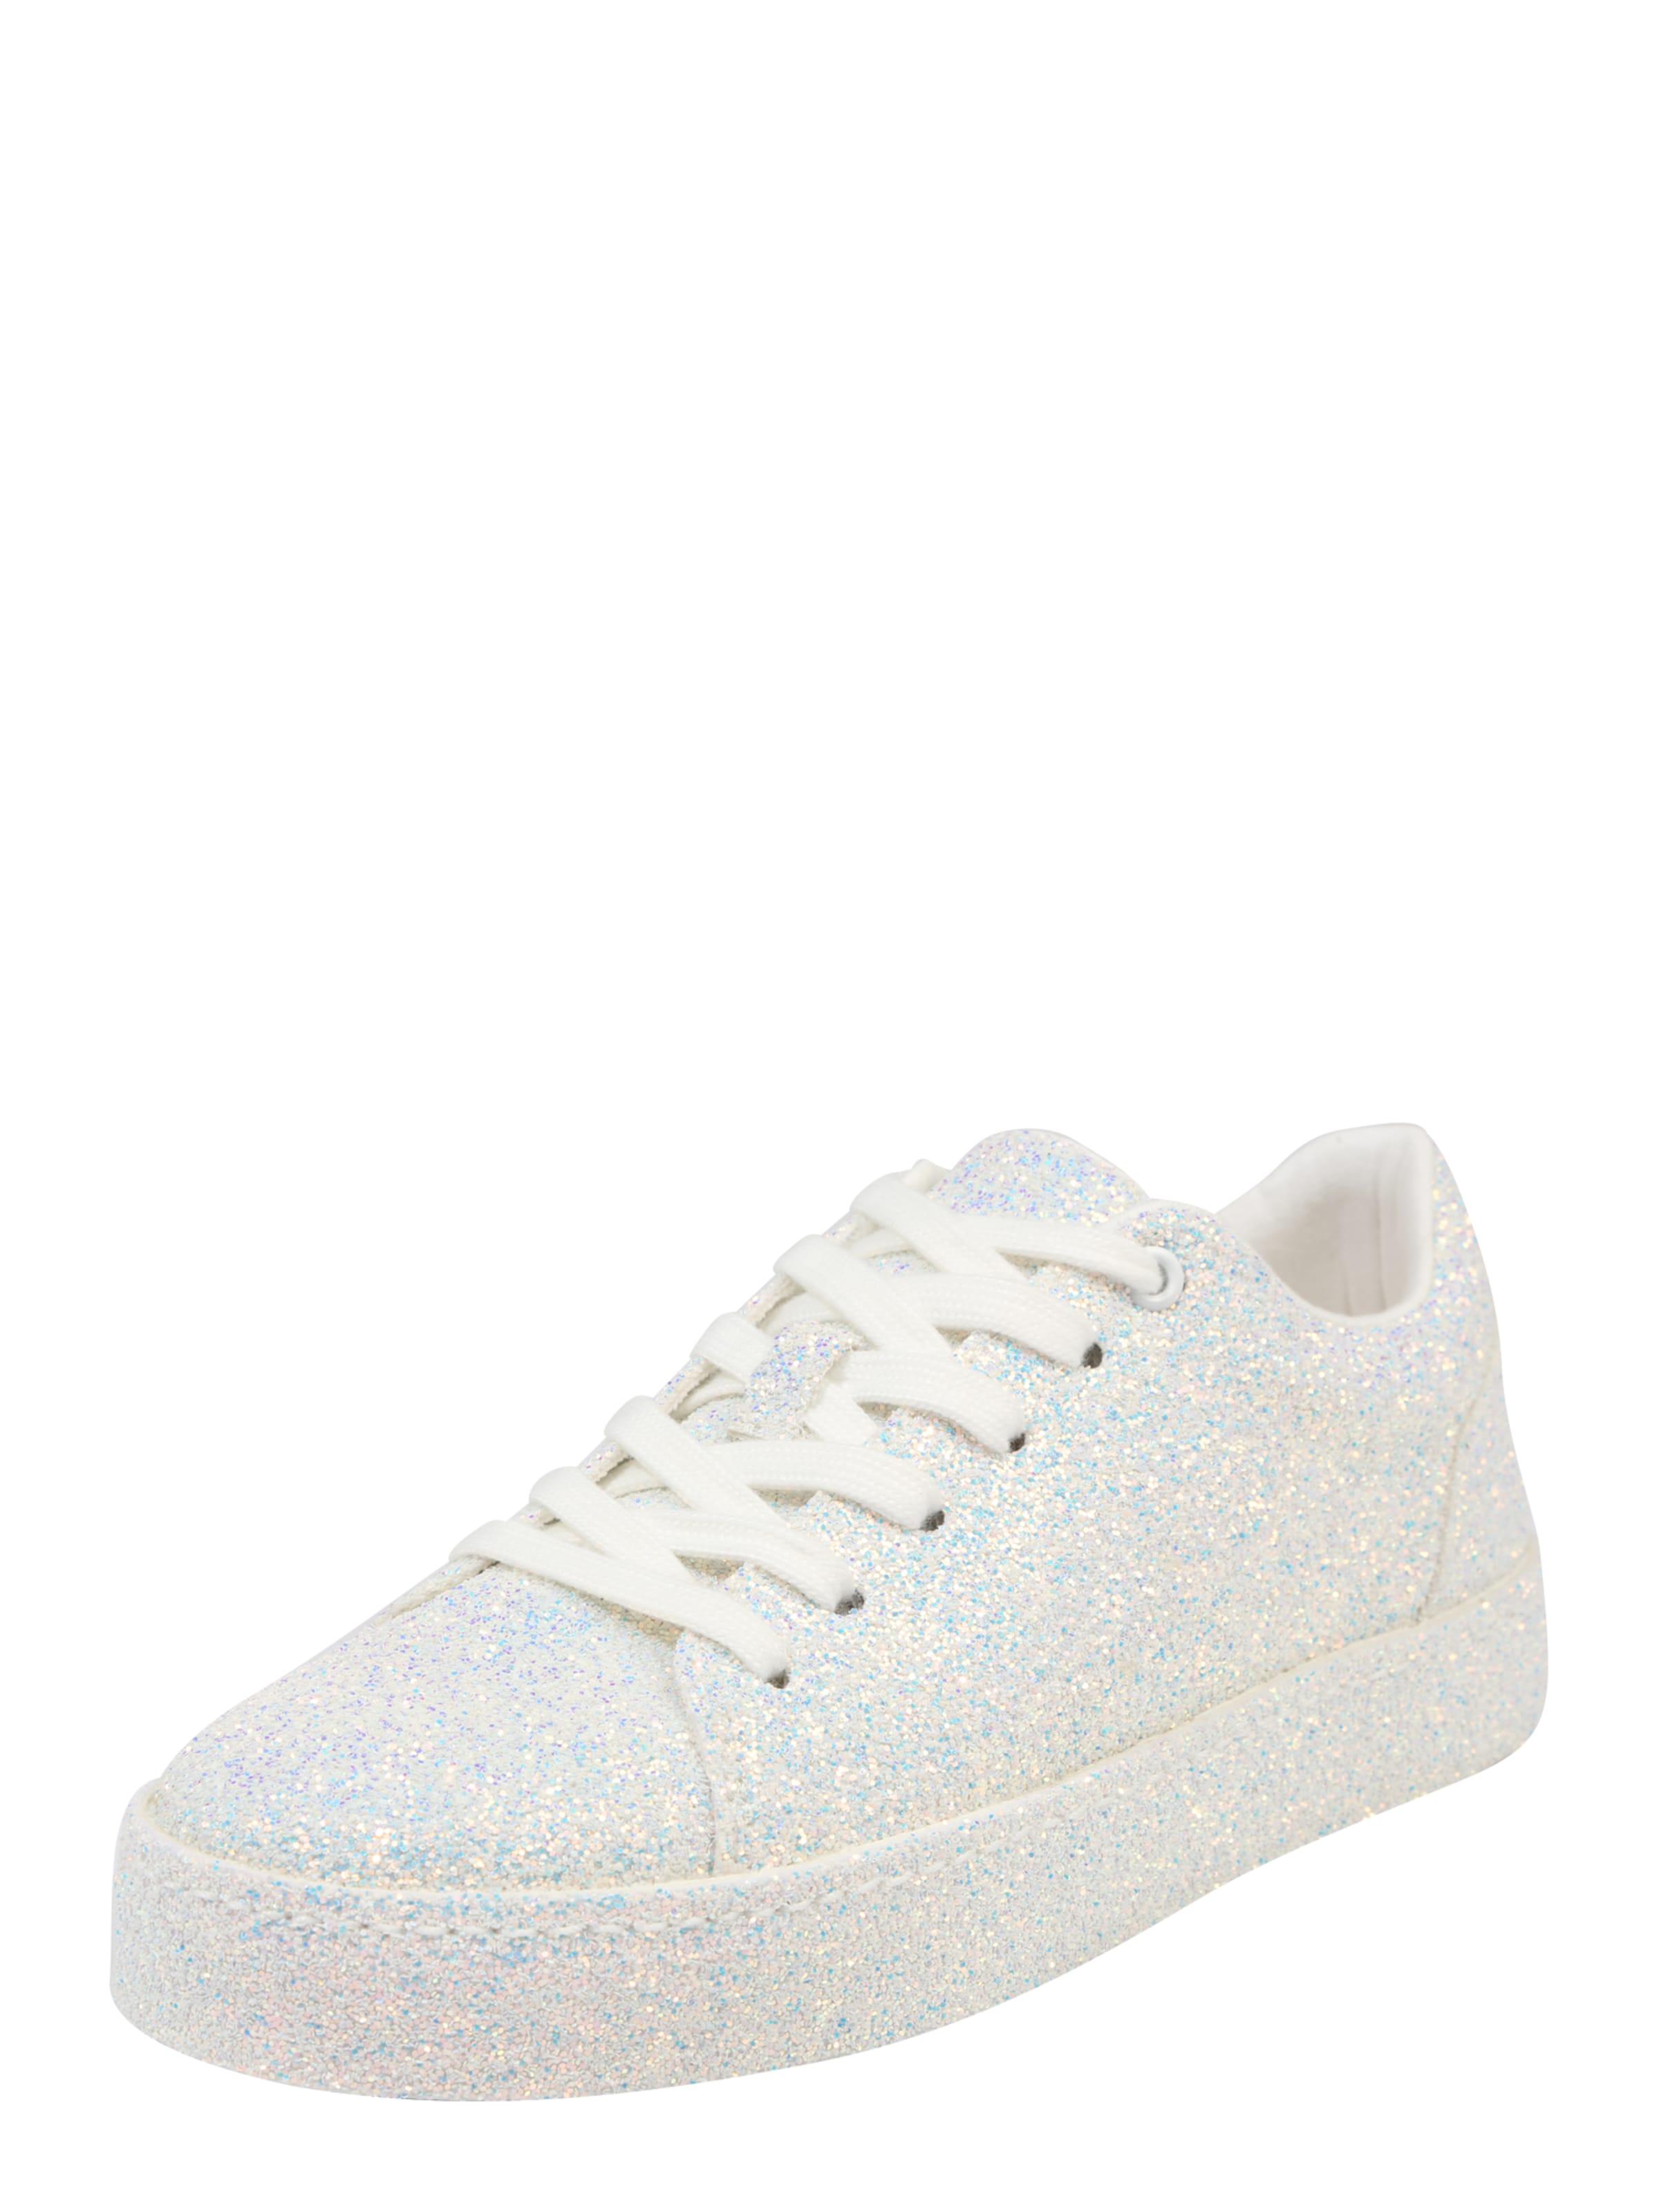 Aldo Sneaker Low 'Etilivia' Weiß 3gmBMDAJ